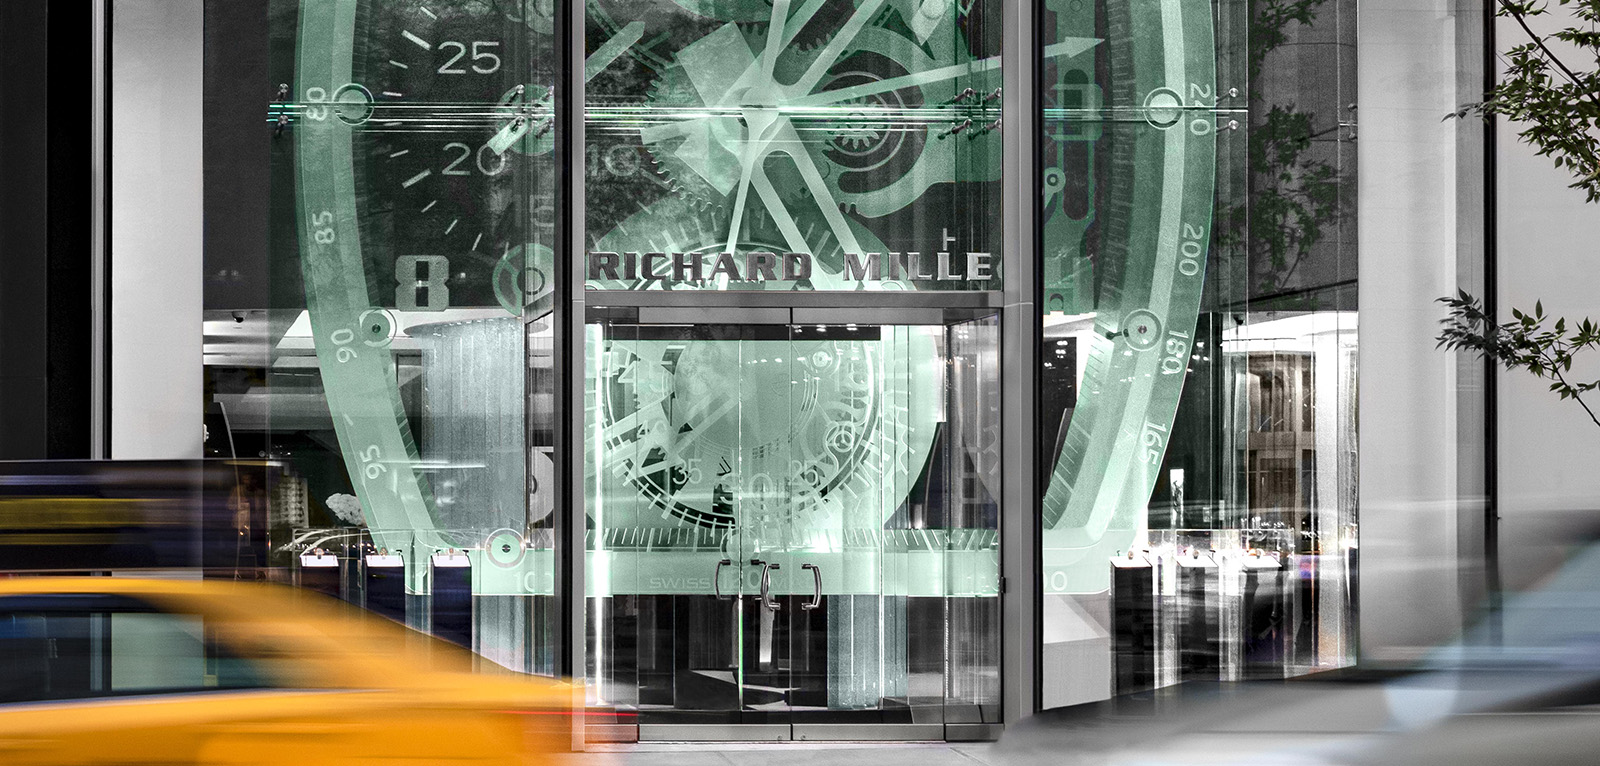 Richard Mille Nueva York